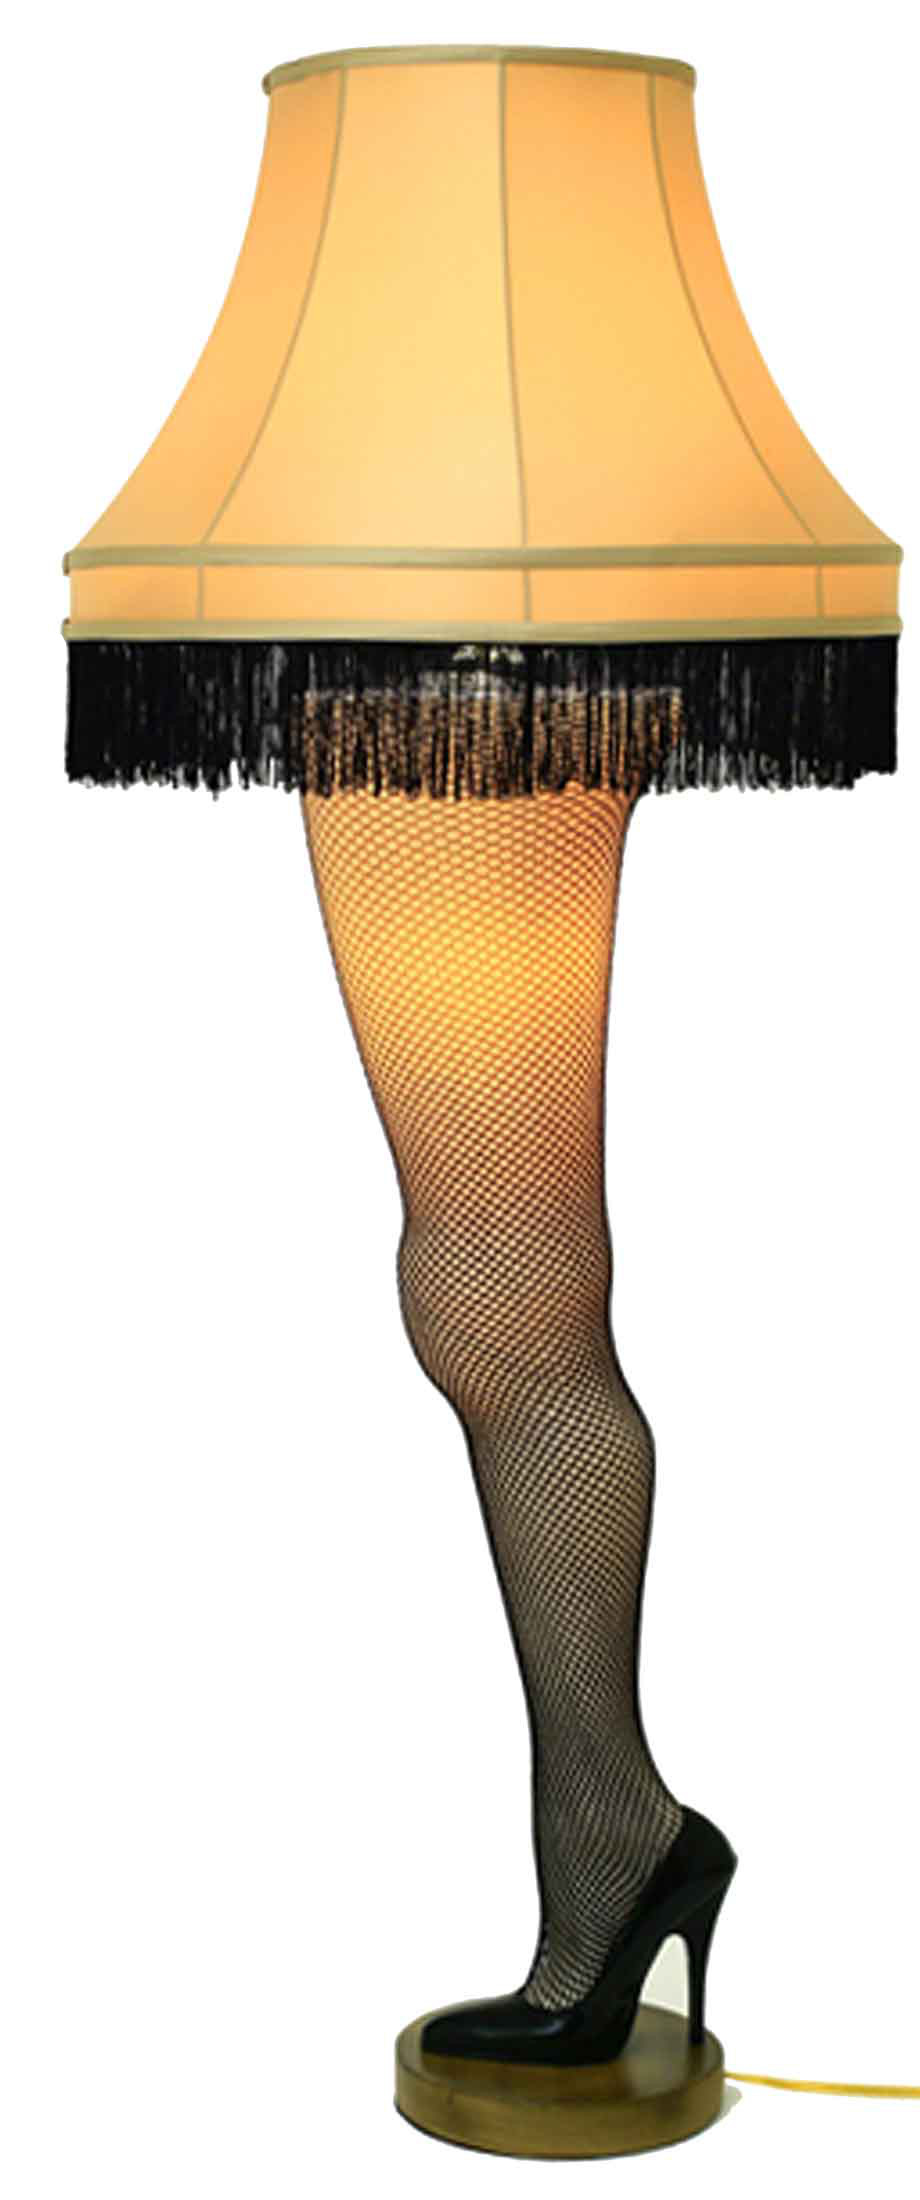 The Christmas Story Leg Lamp  Leg Lamp Warehouse 13 Wiki